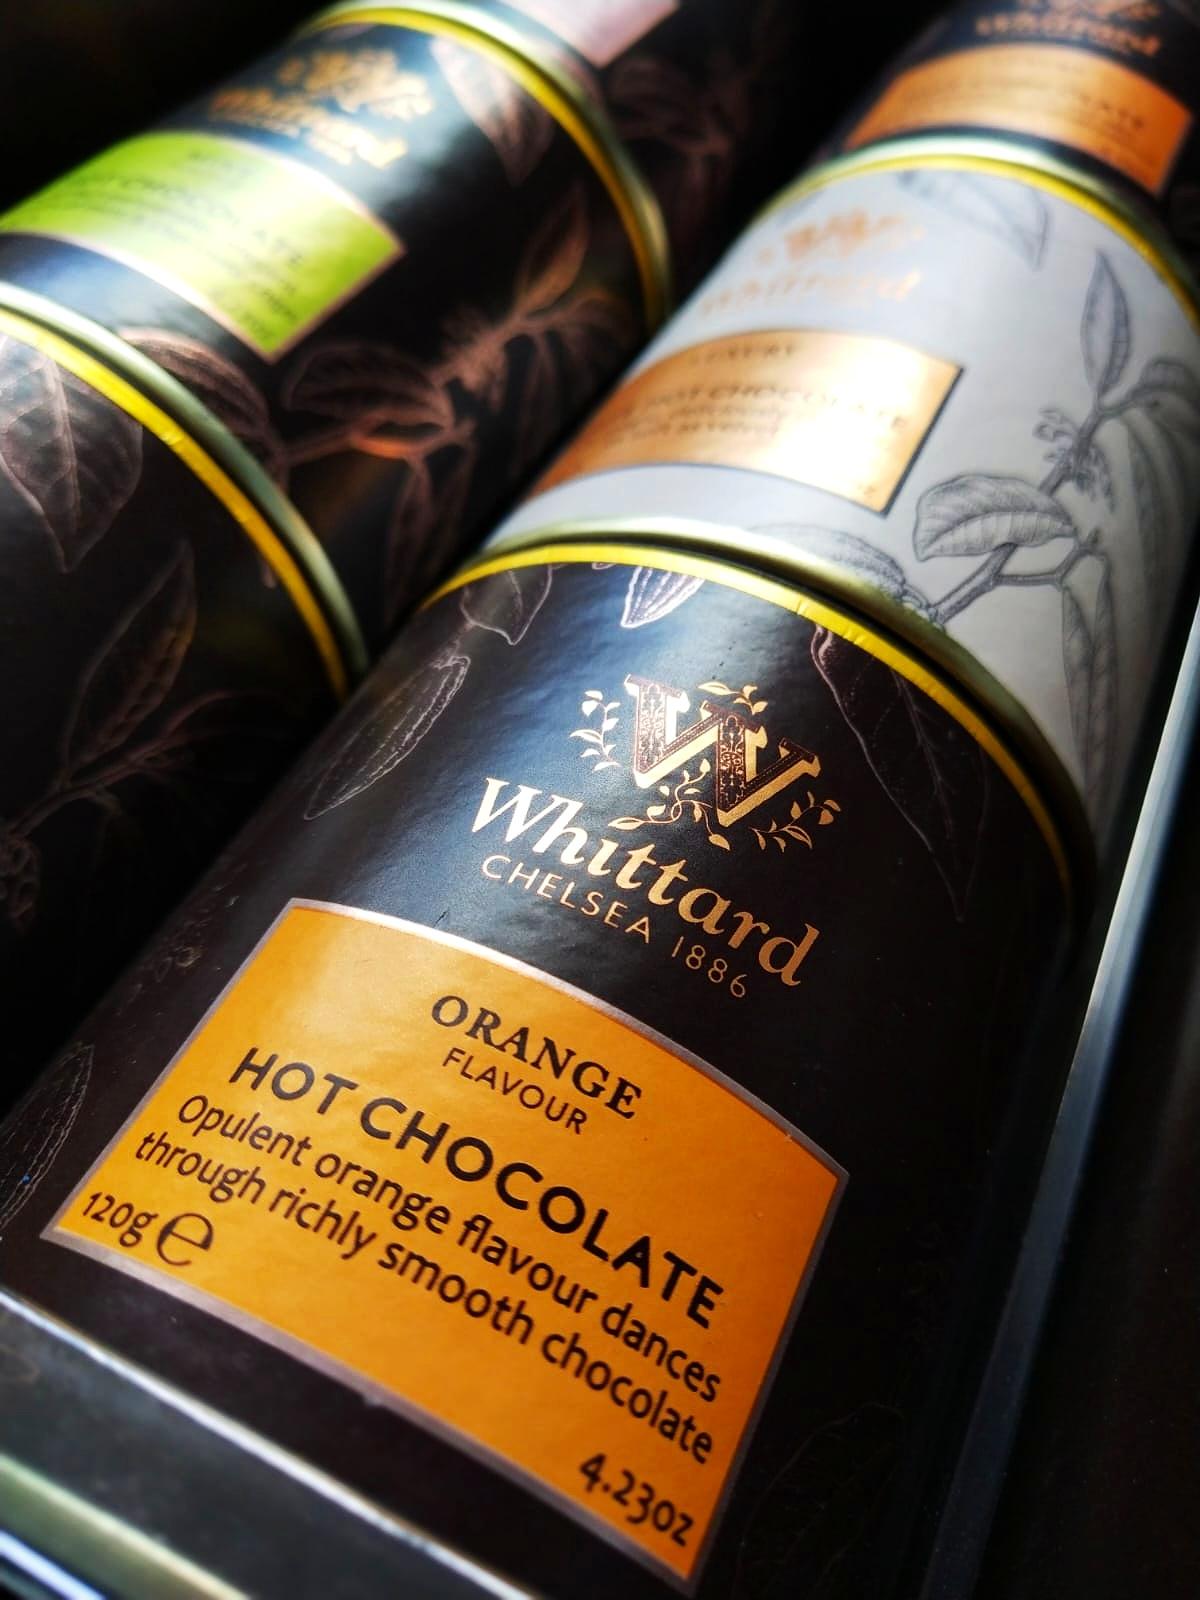 Whittard of Chelsea 1886 Hot chocolate